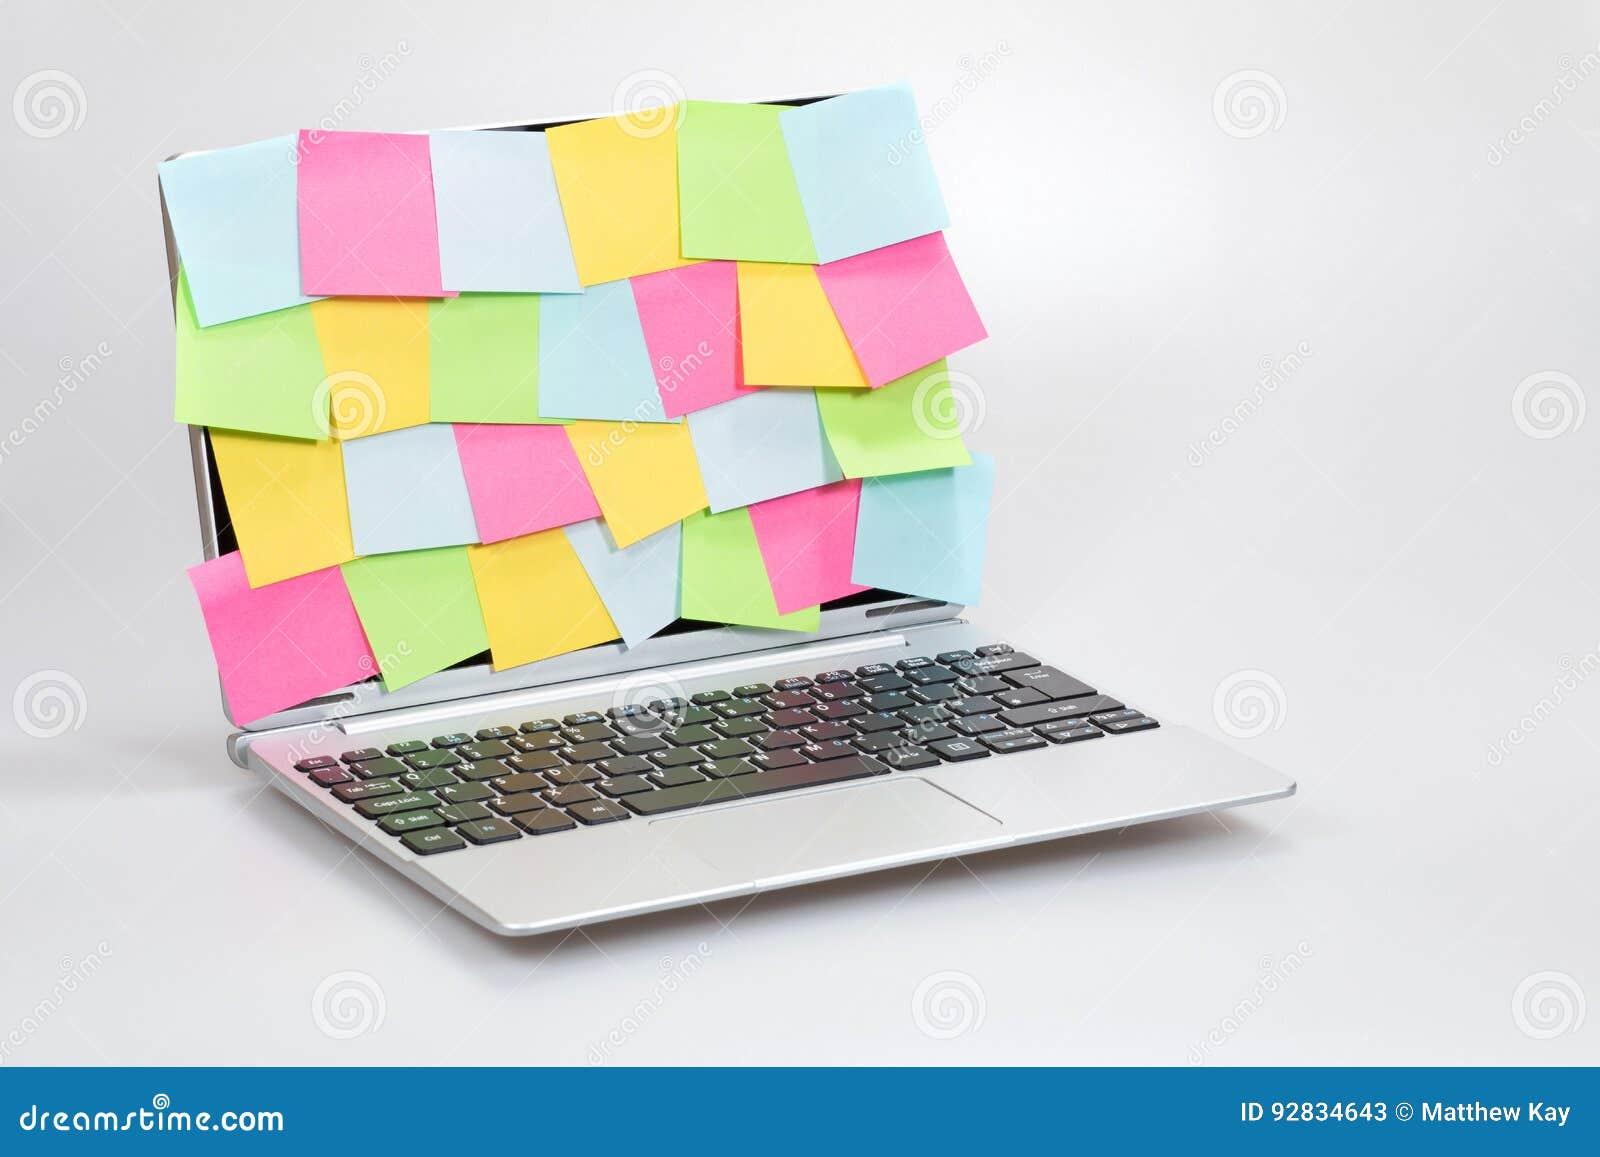 Business multitasking, ideas and organisation